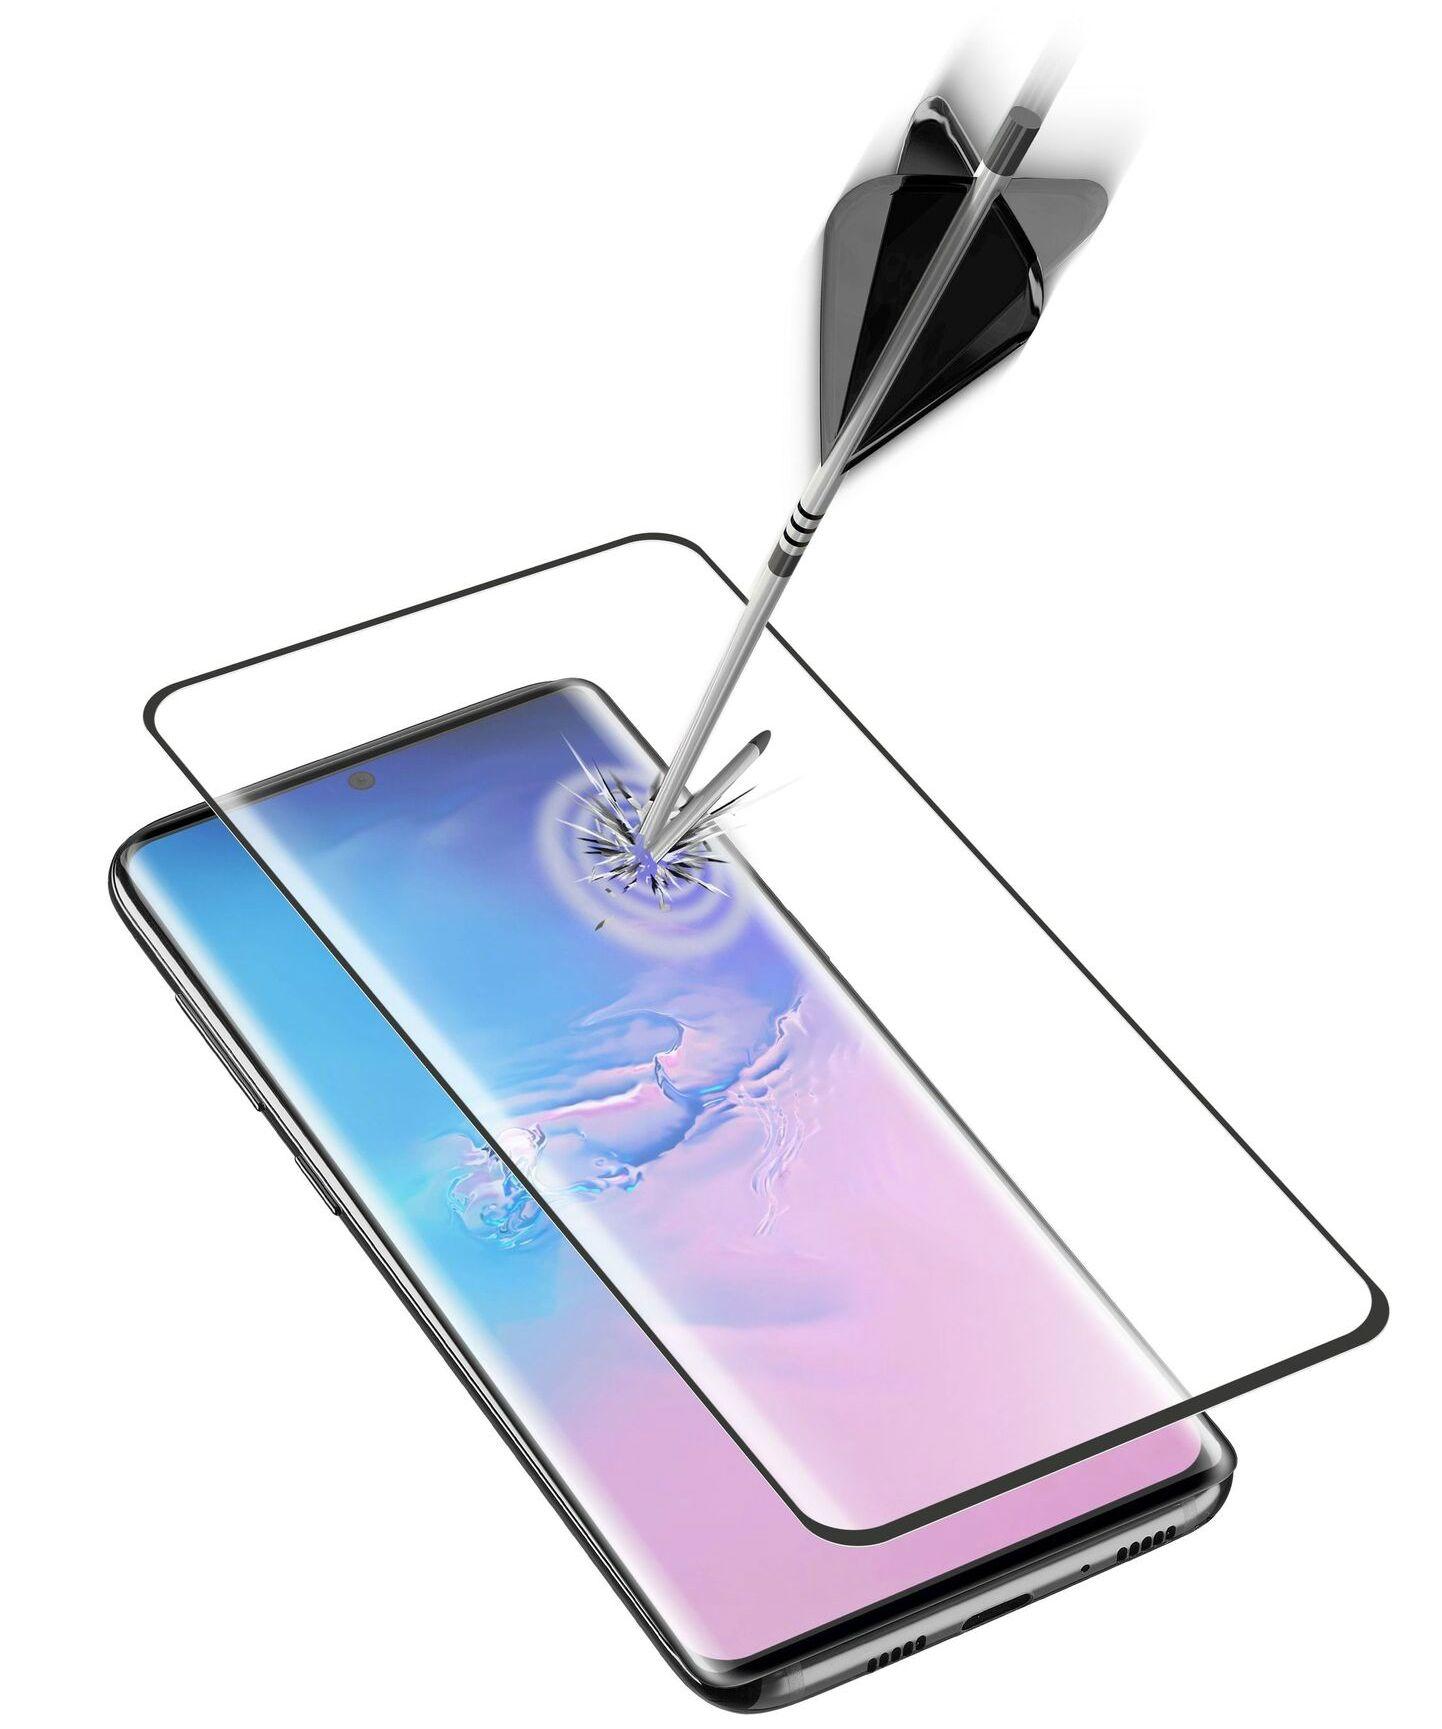 Закалено 3D стъкло Cellularline - за Samsung Galaxy S20 Ultra, черно - 1